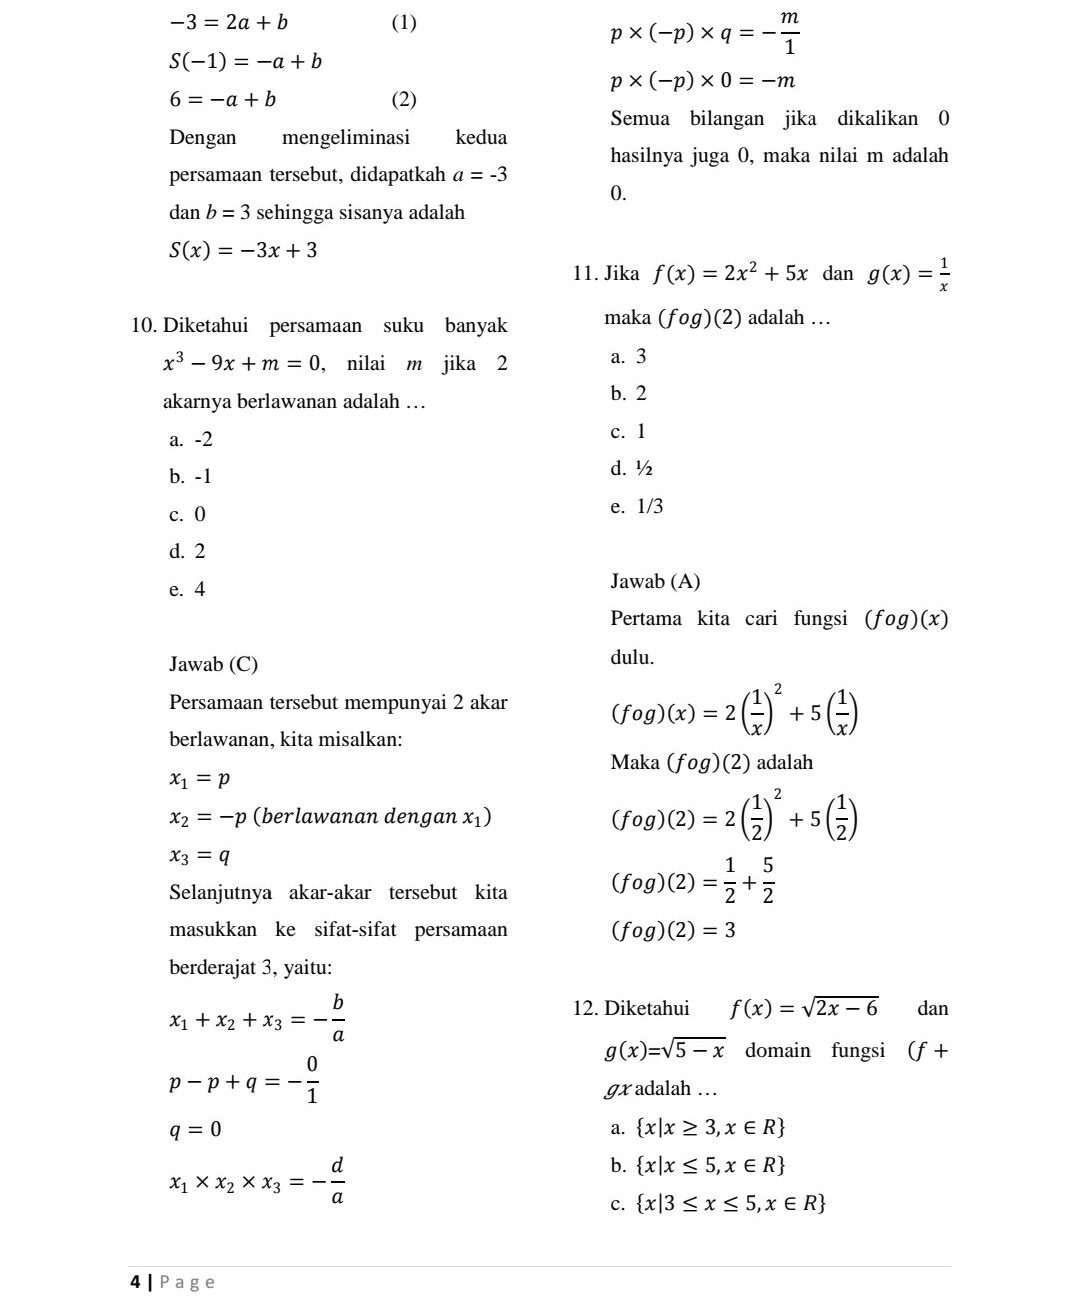 Soal Uas Matematika Kelas 5 Semester 1 Dan Kunci Jawabannya